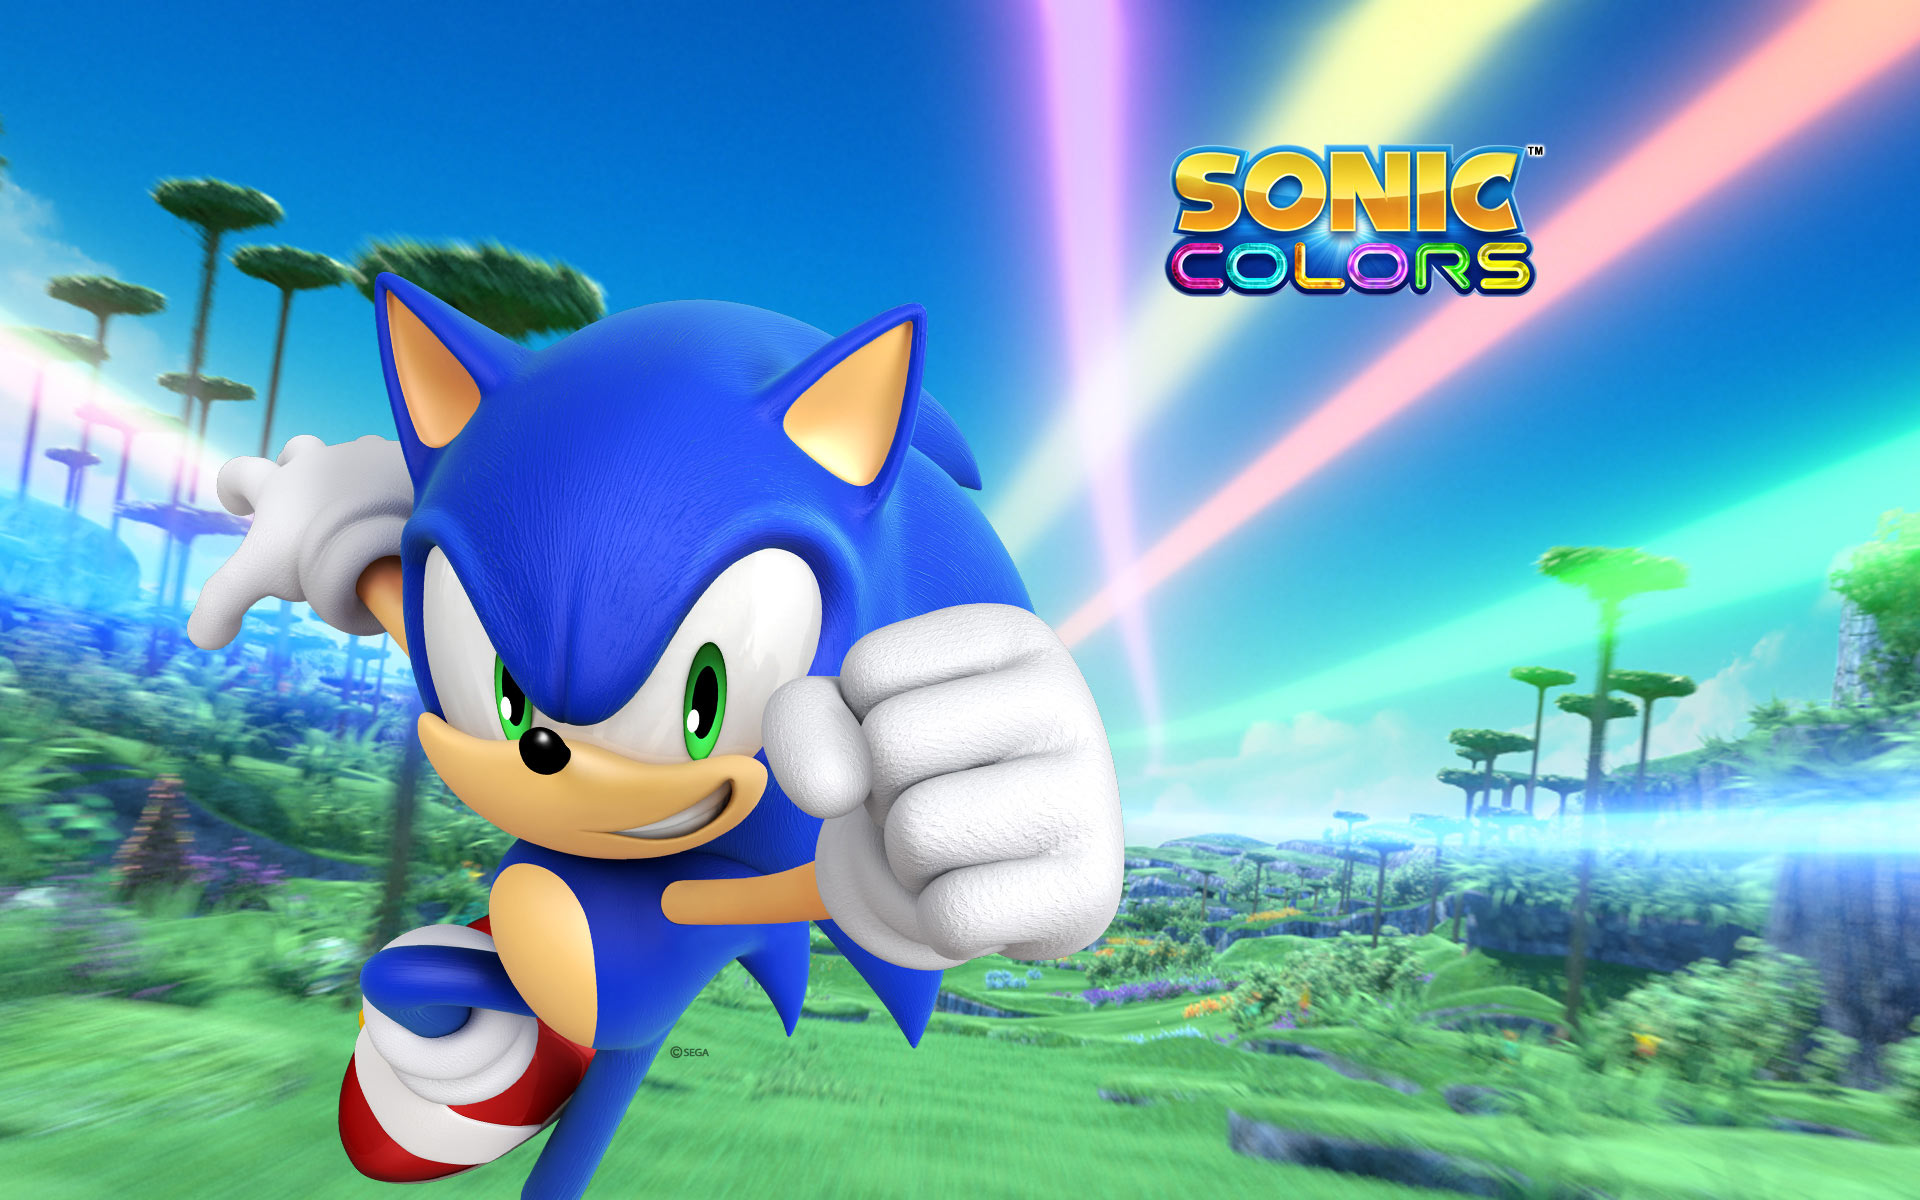 Sonic the Hedgehog HD Desktop Wallpaper for K Ultra HD TV